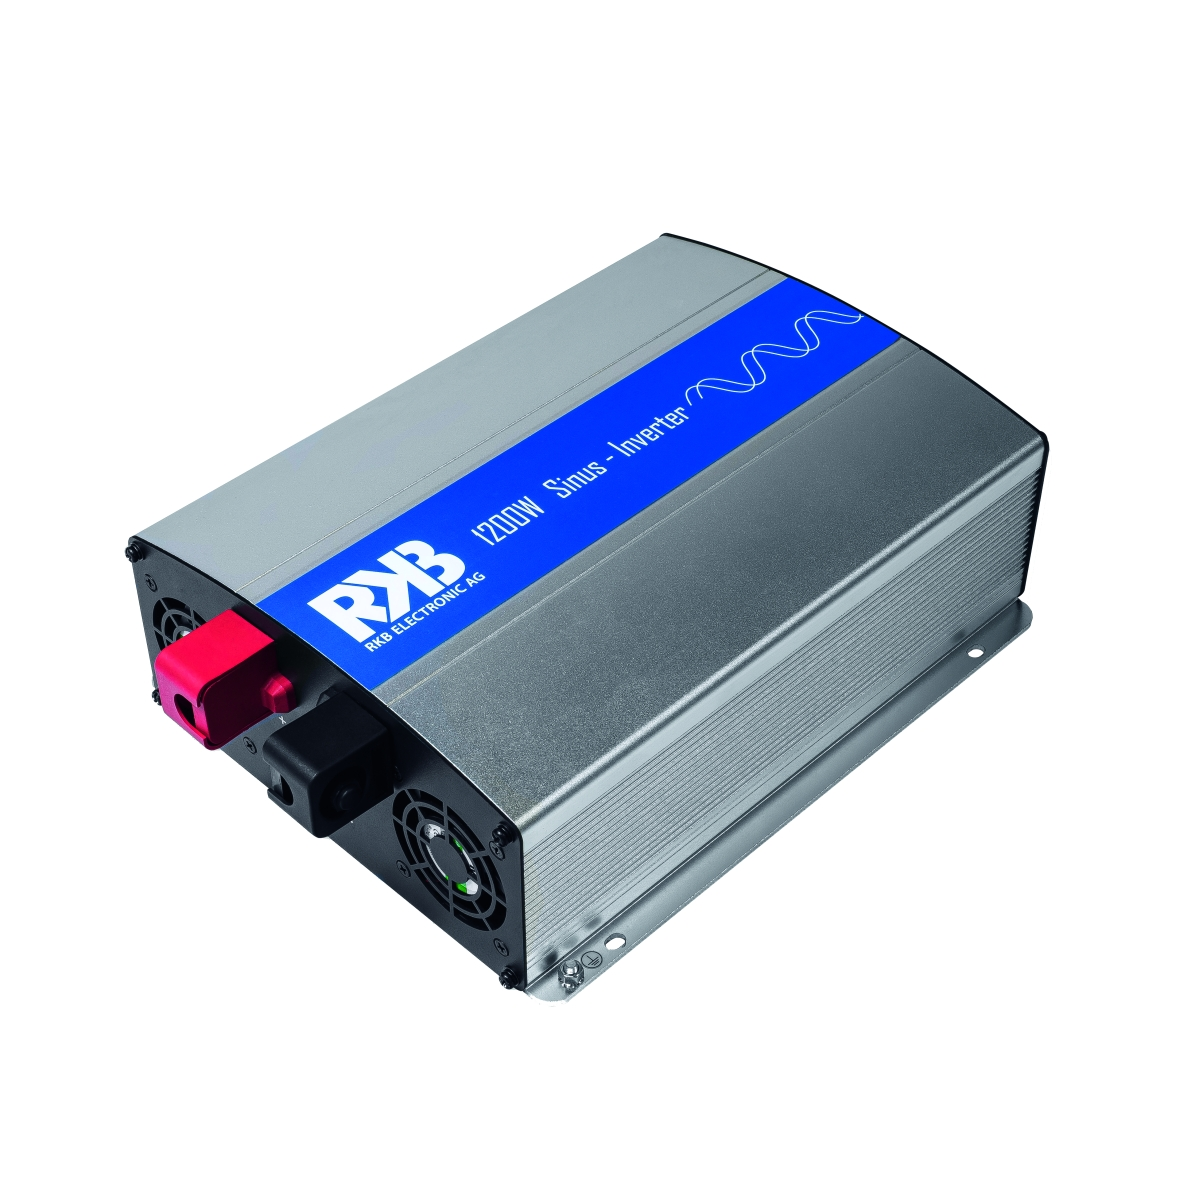 ProUser Sinus-Wechselrichter RKB 1200-12